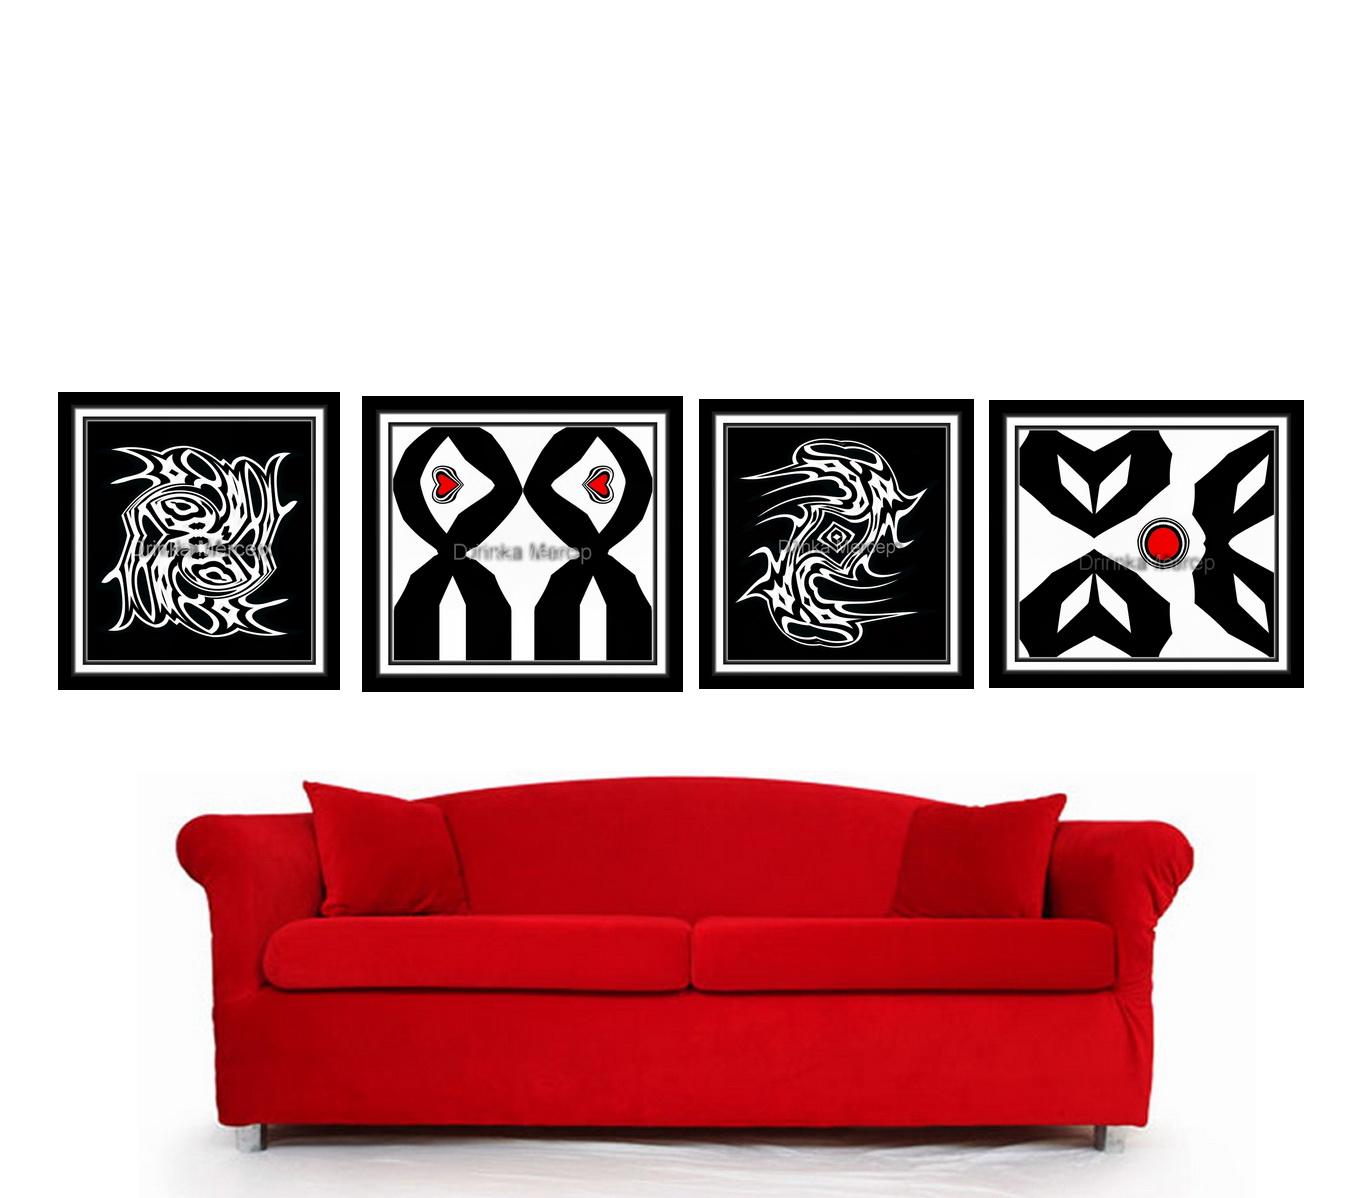 Drinka mercep for Art post minimalisme